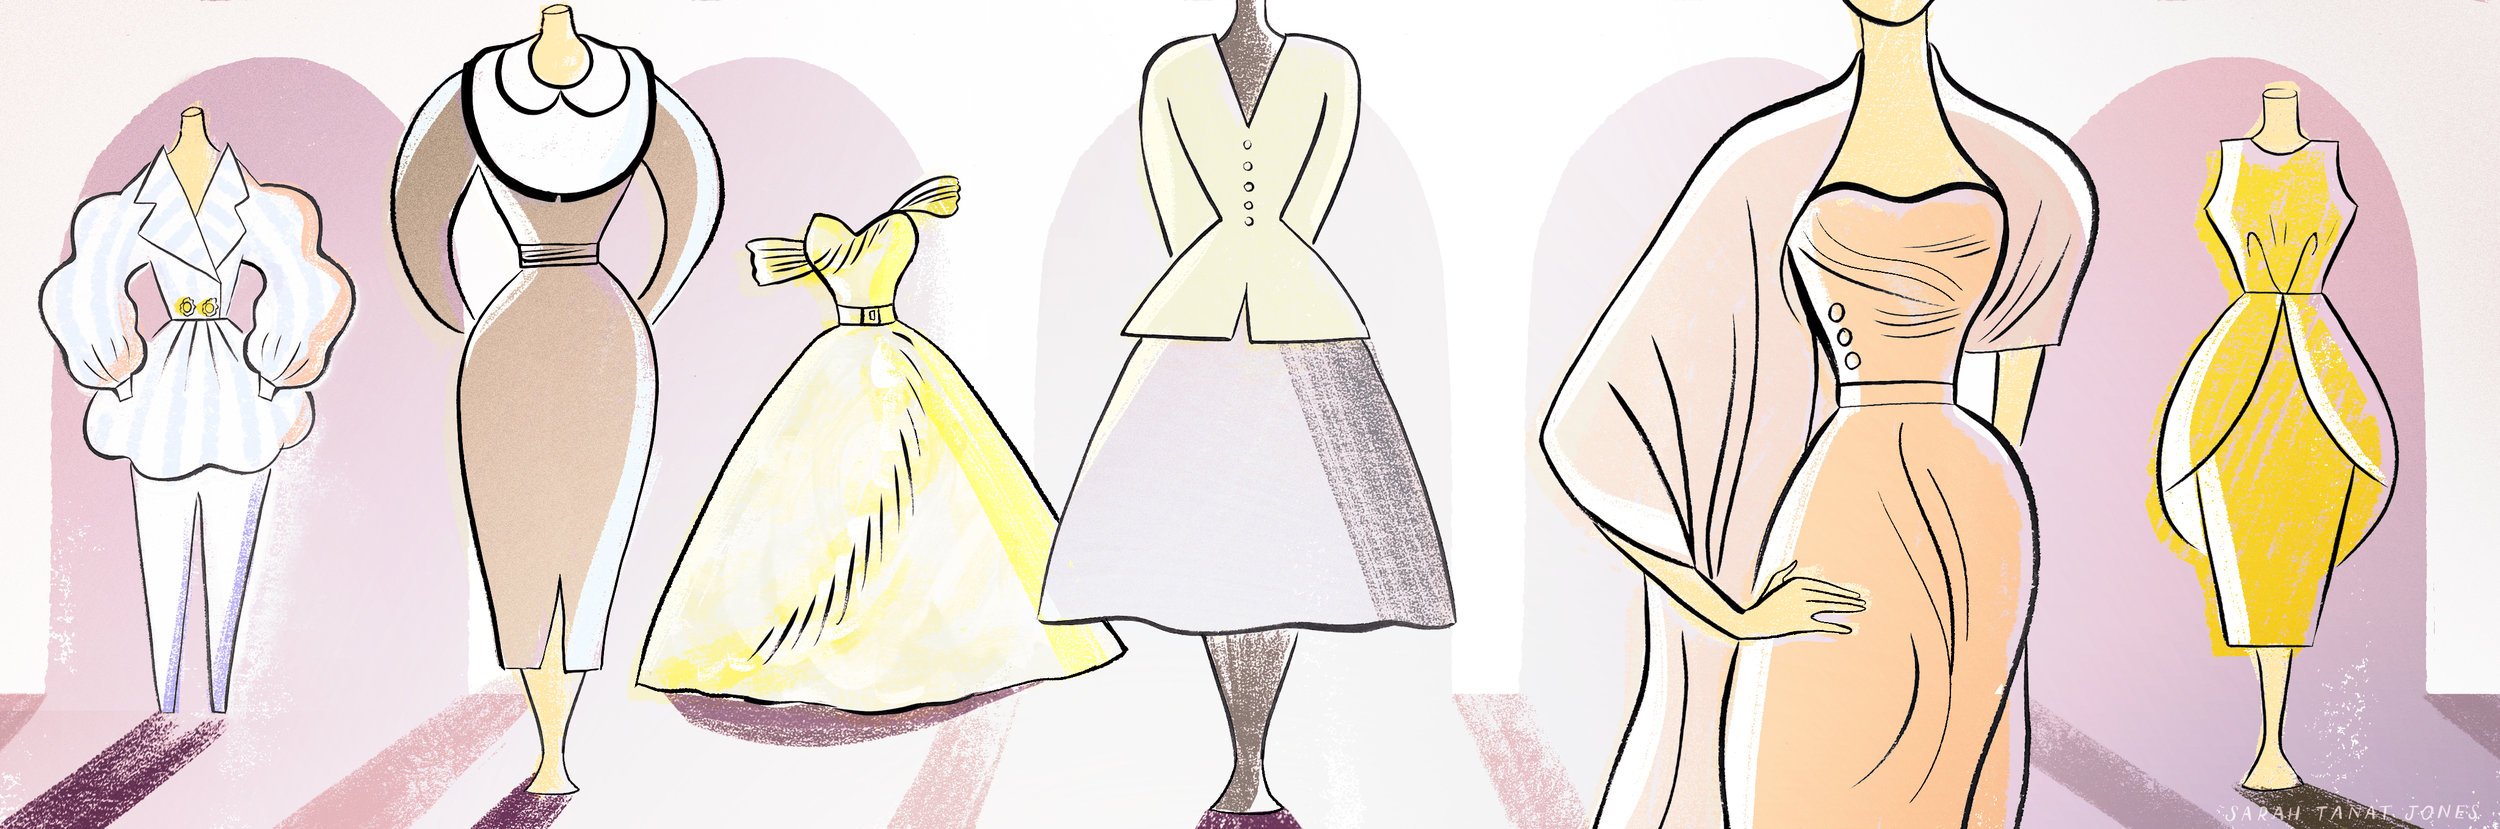 telegraph - Dior final.jpg